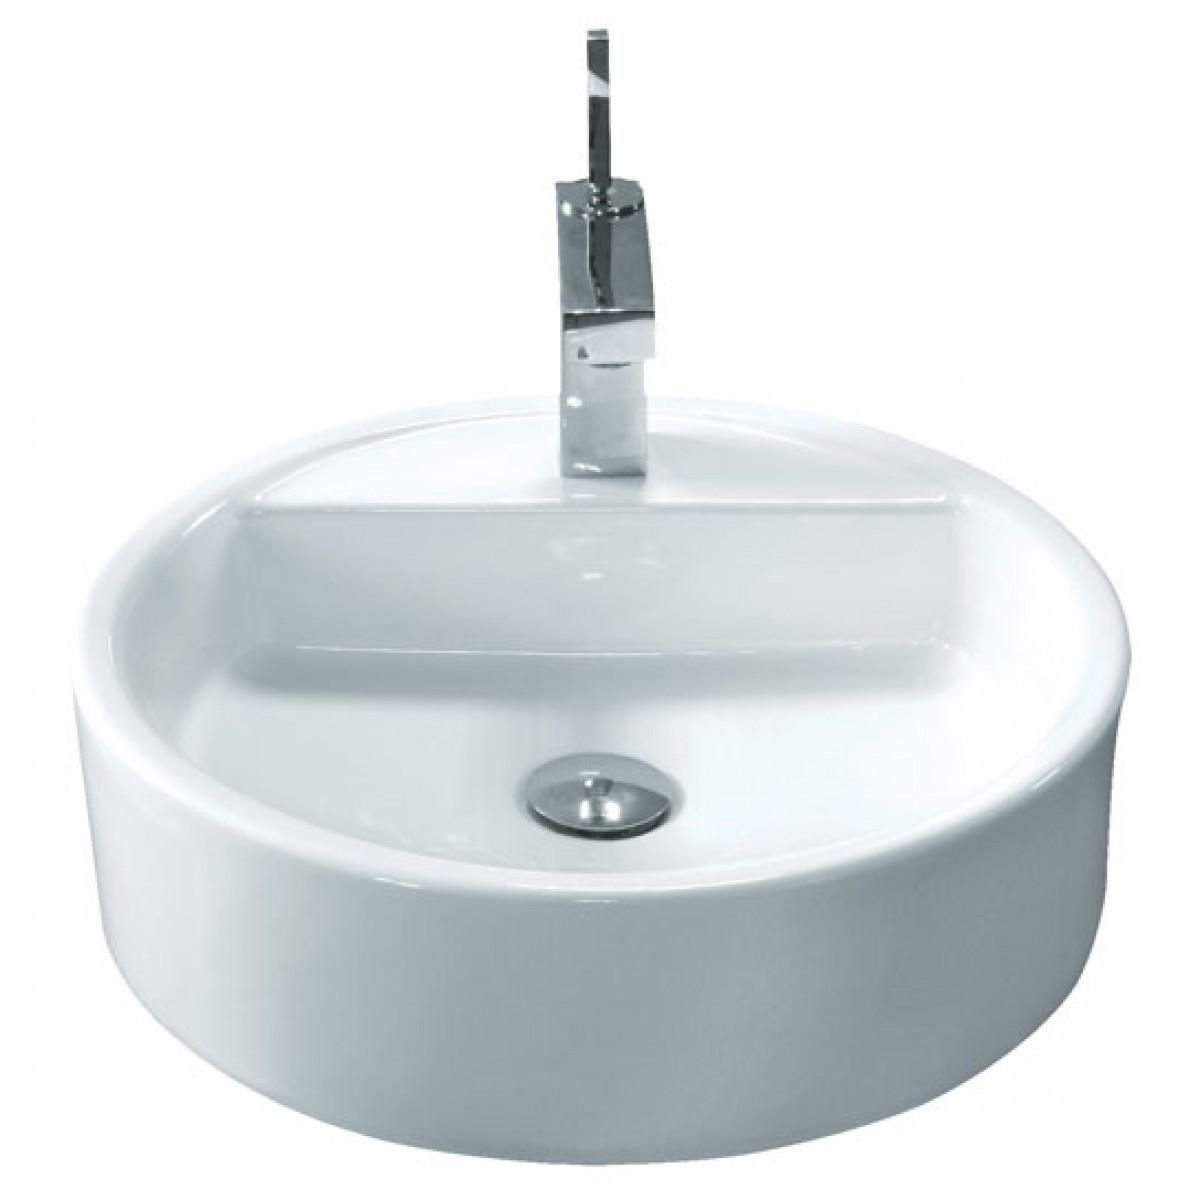 Round Porcelain Ceramic Single Hole Countertop Bathroom Vessel Sink ...